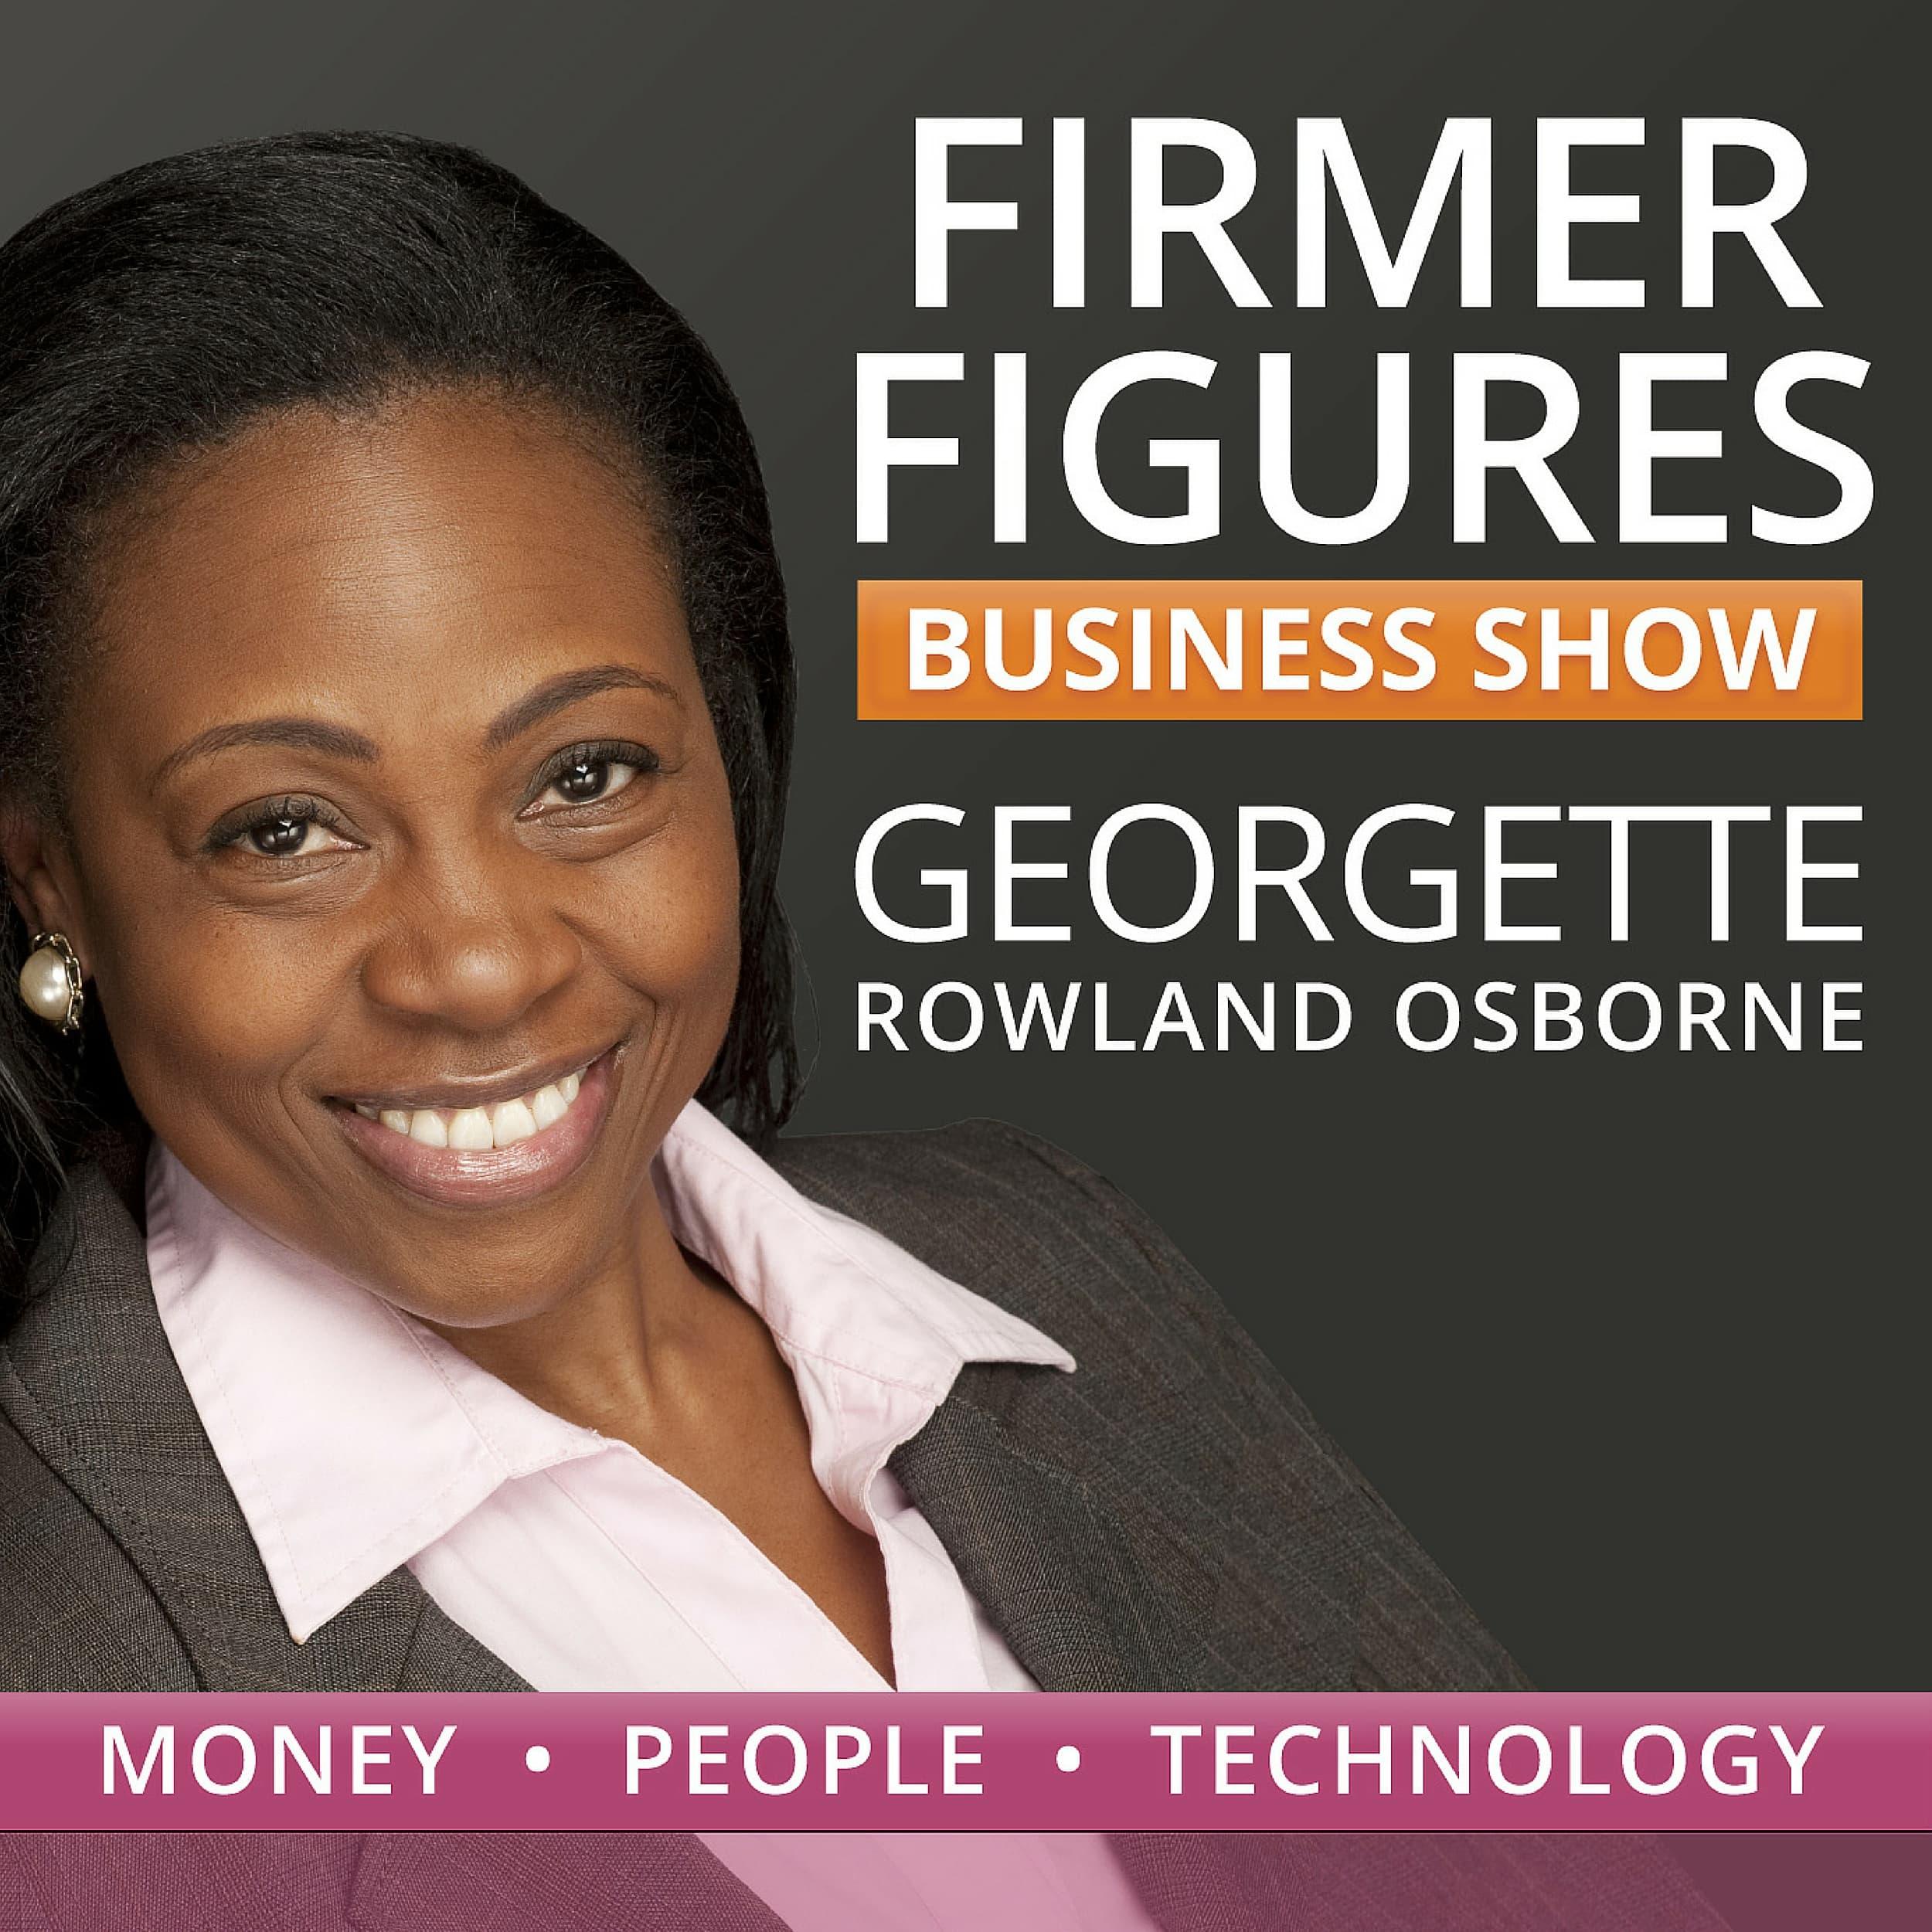 Firmer Figures Business Show | Grow Your Money| Get a Life!